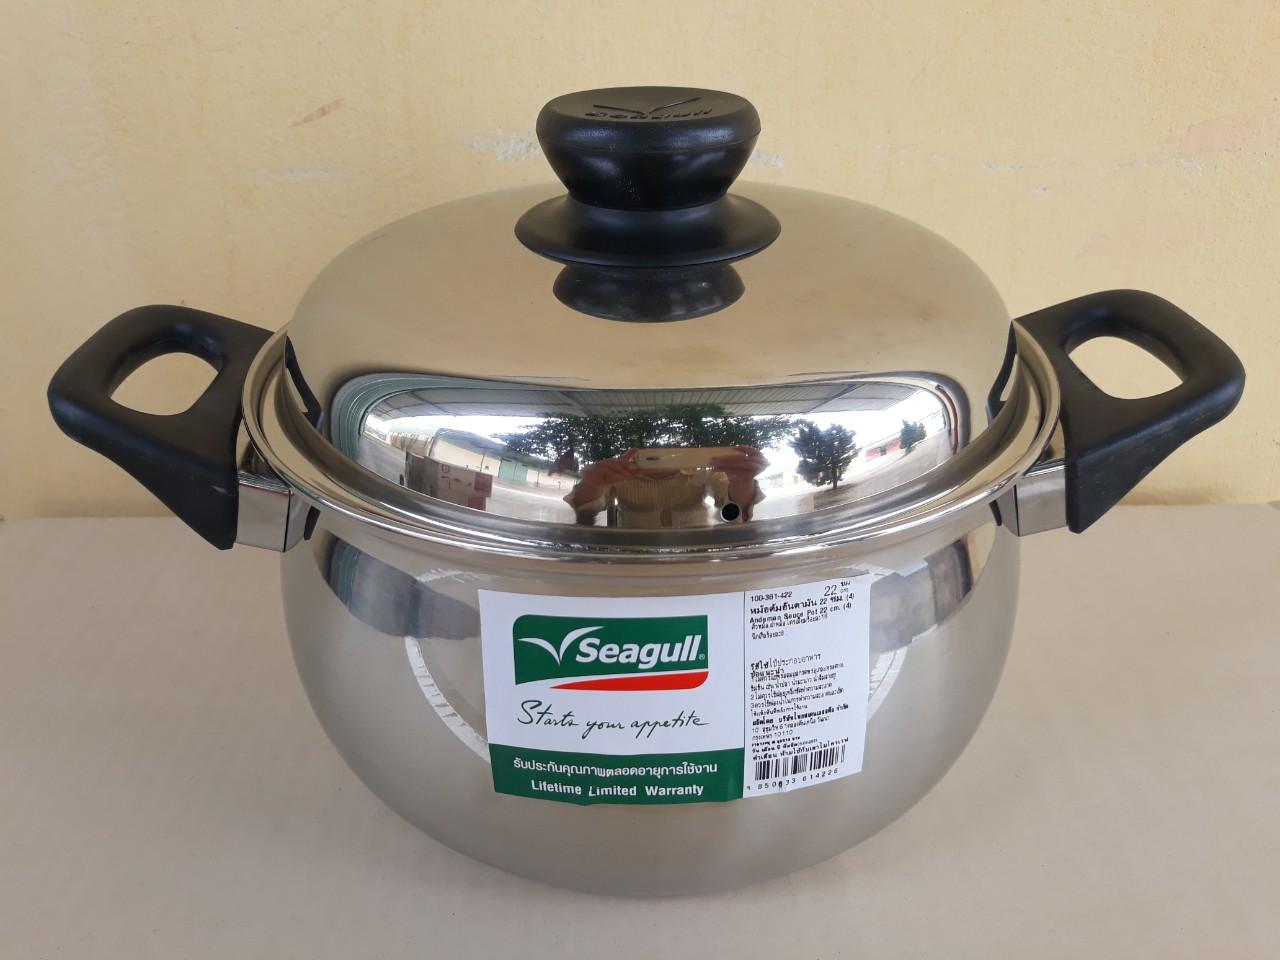 Nồi nấu canh seagull 22cm - 4.9 lít (Andaman) 100361422